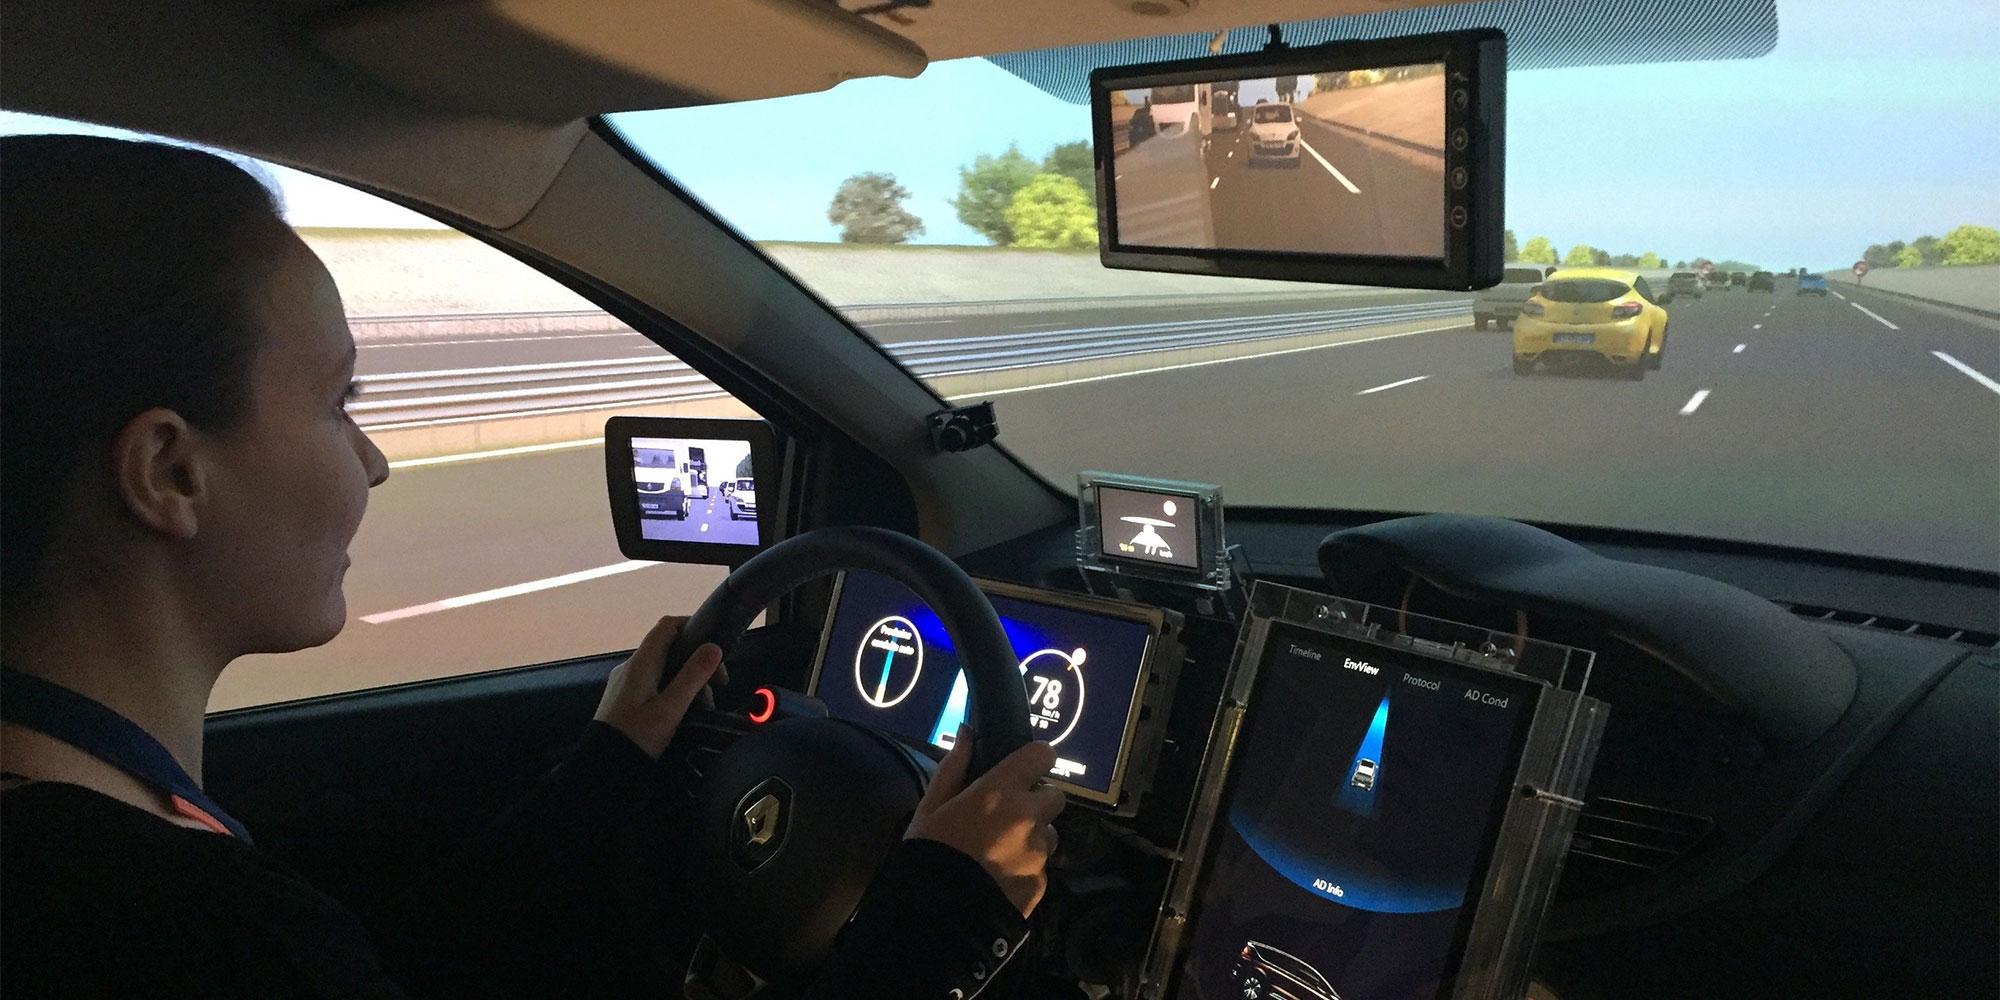 Autonome Fahrzeuge laufen bei Renault auf Hochtouren